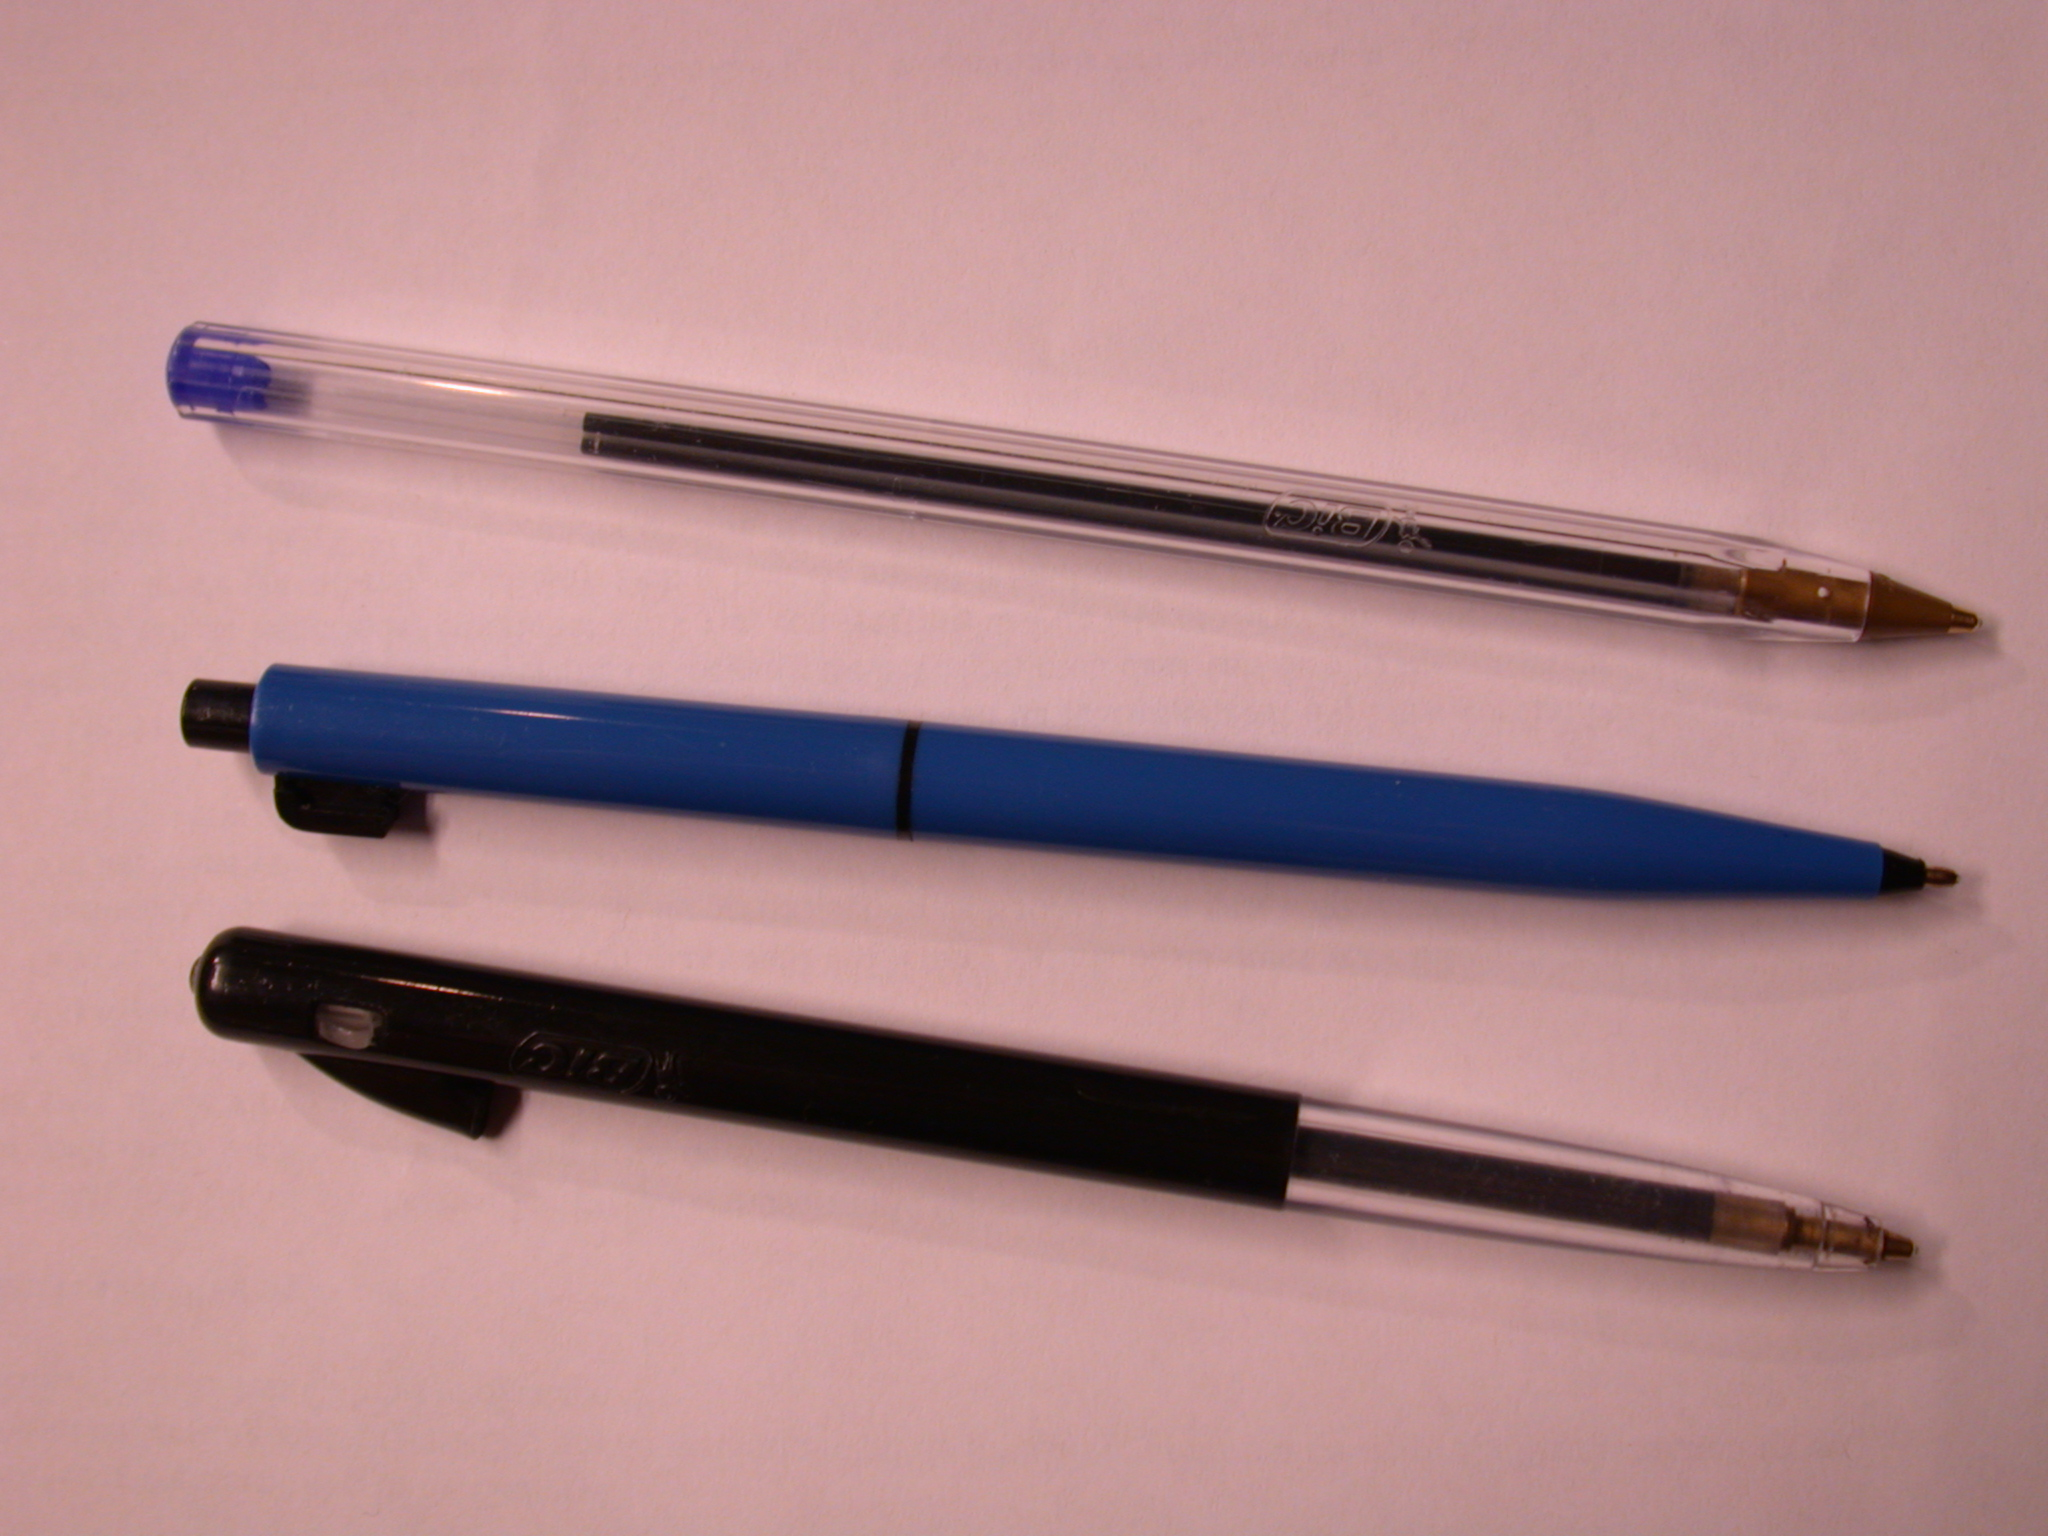 objects household pen pencil pens pencils writing plastic bic bics ballpoint ballpoints